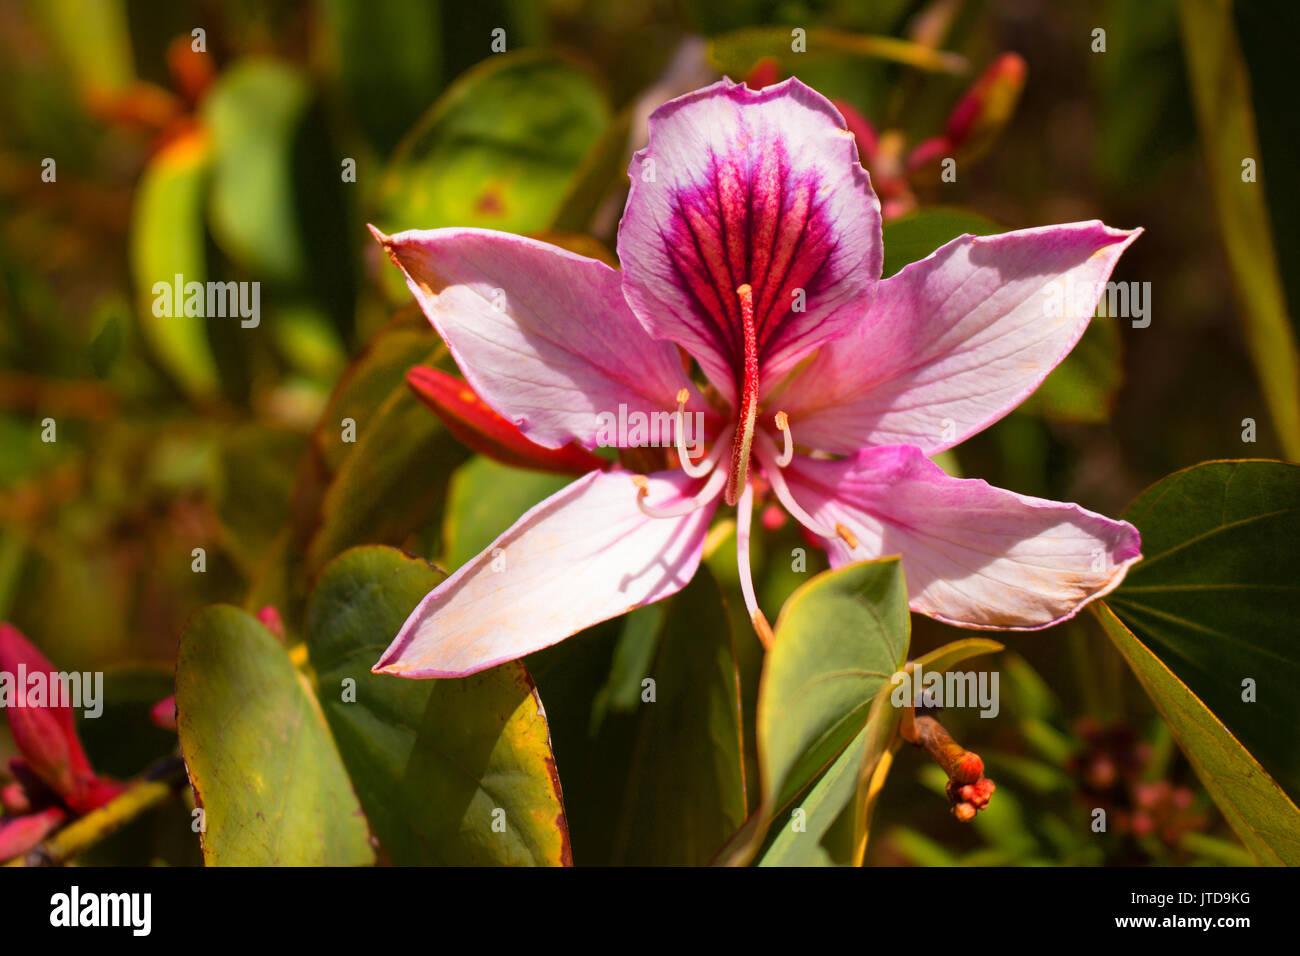 Flower. Beautiful Mediterranean pink flowers. Spring decoration. - Stock Image